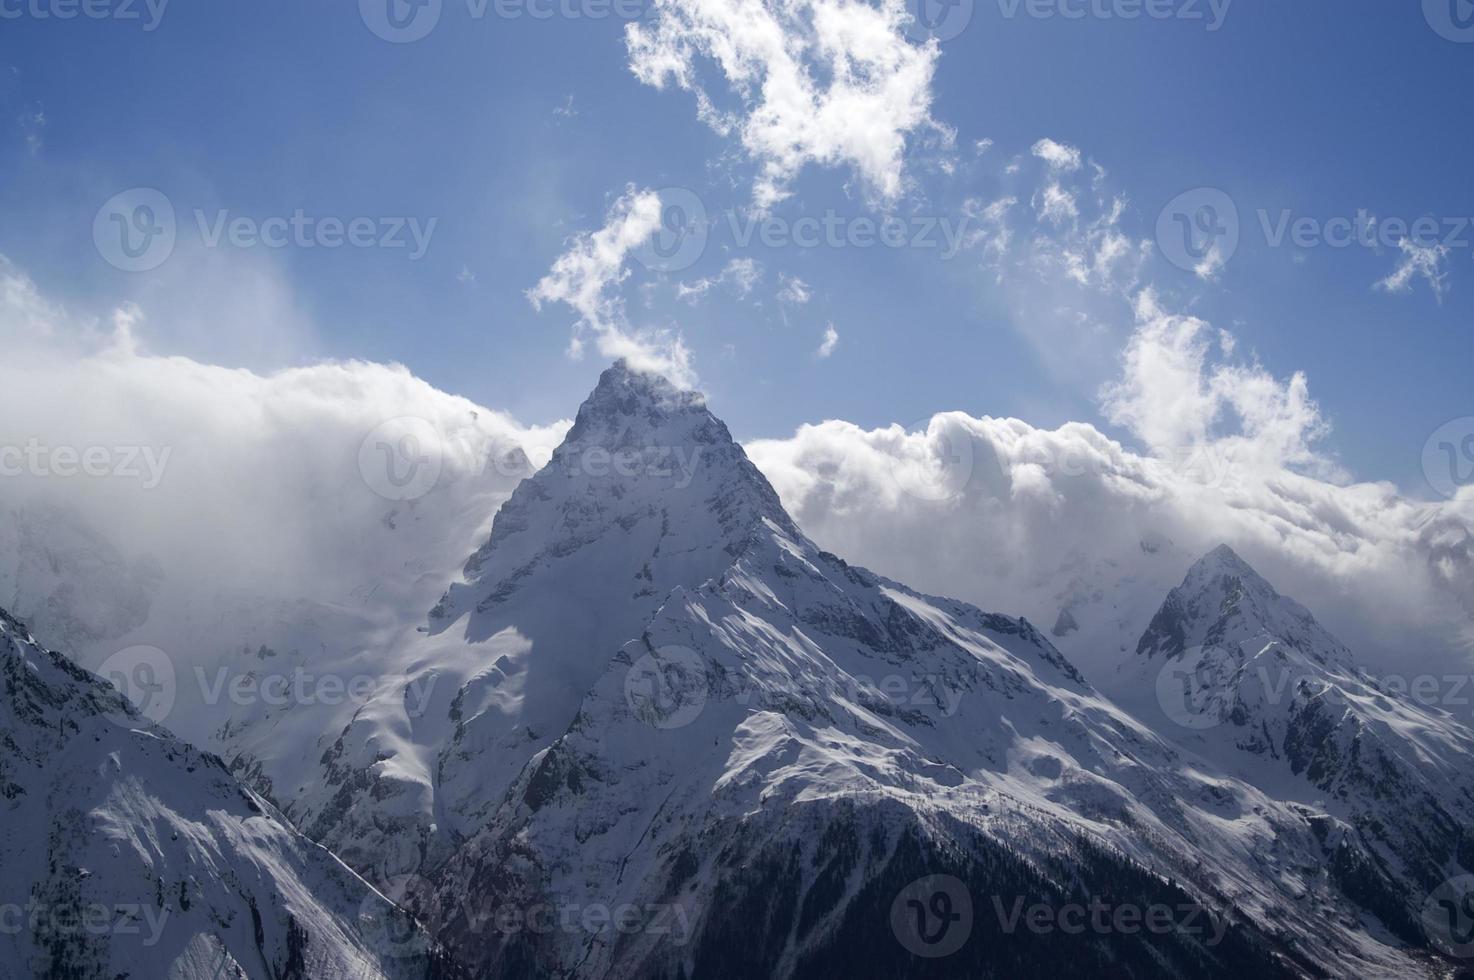 bewolkte bergen. Caucasus Mountains, Dombay. foto